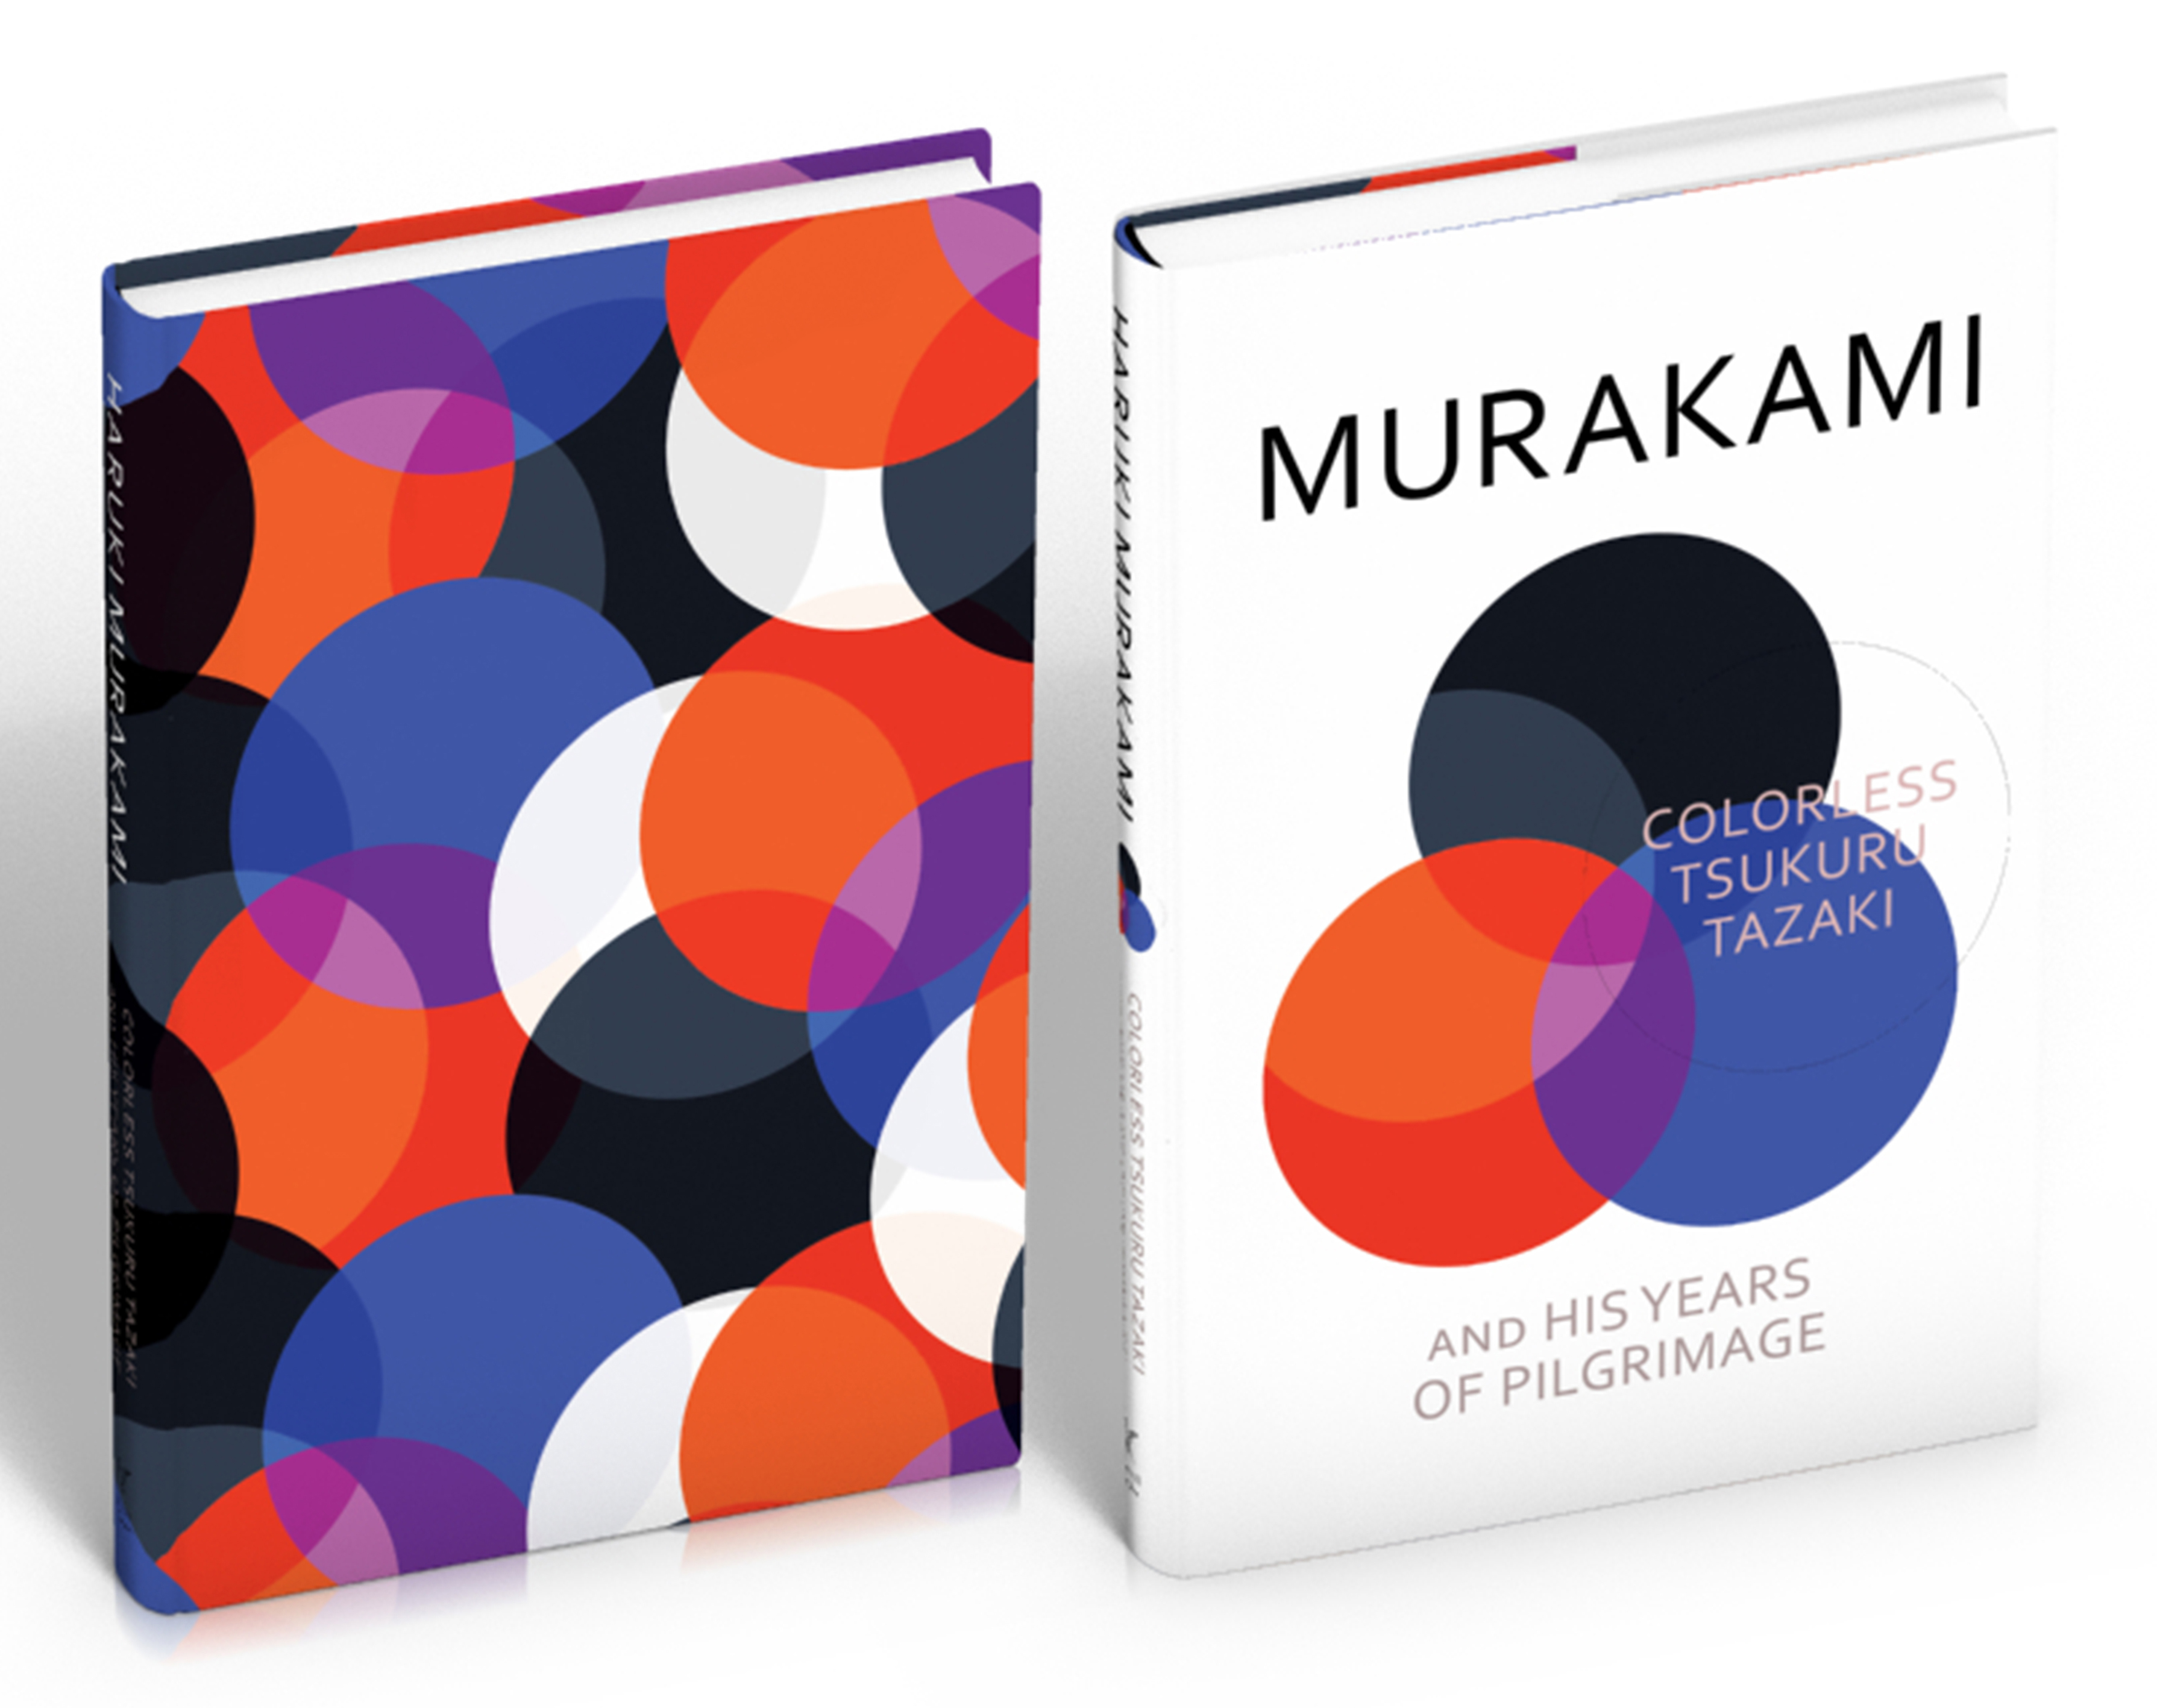 Passionate longing for dialogue 1 colorless tsukuru tazaki and tsukuru cover and board together murakami buycottarizona